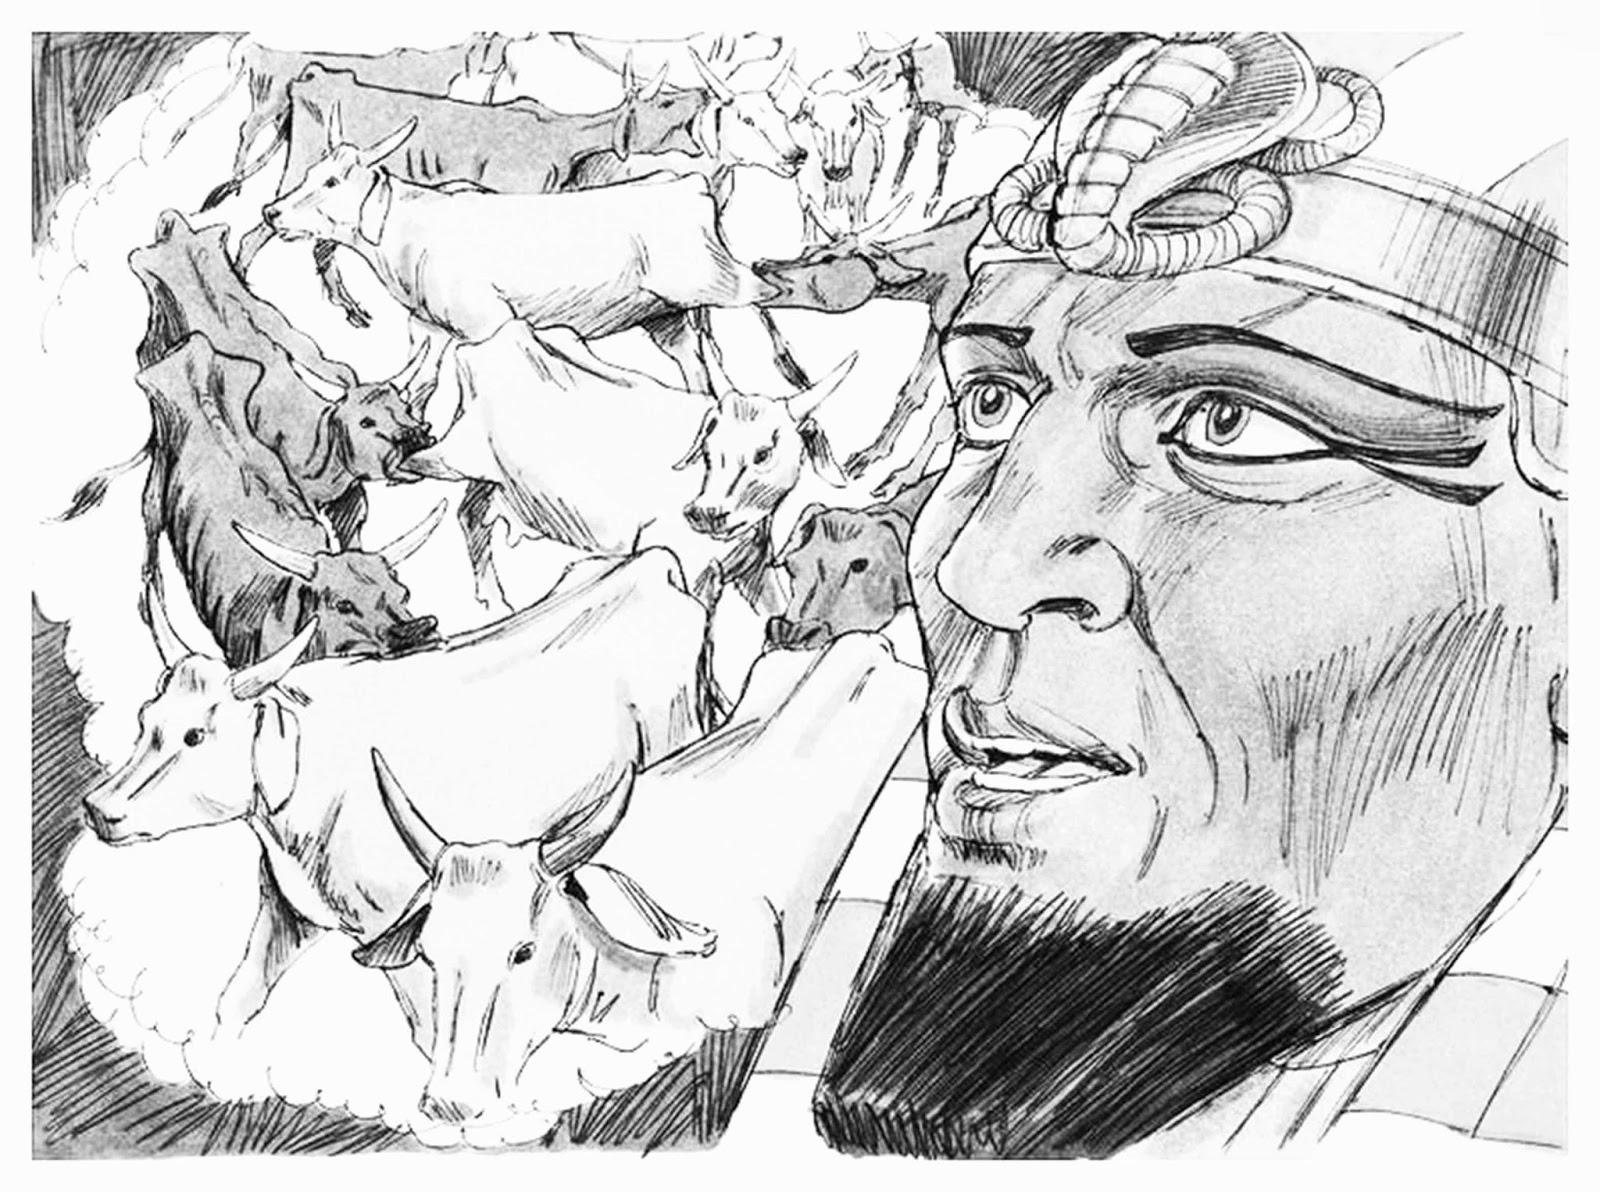 joseph pharaohs dreams coloring pages - photo#16